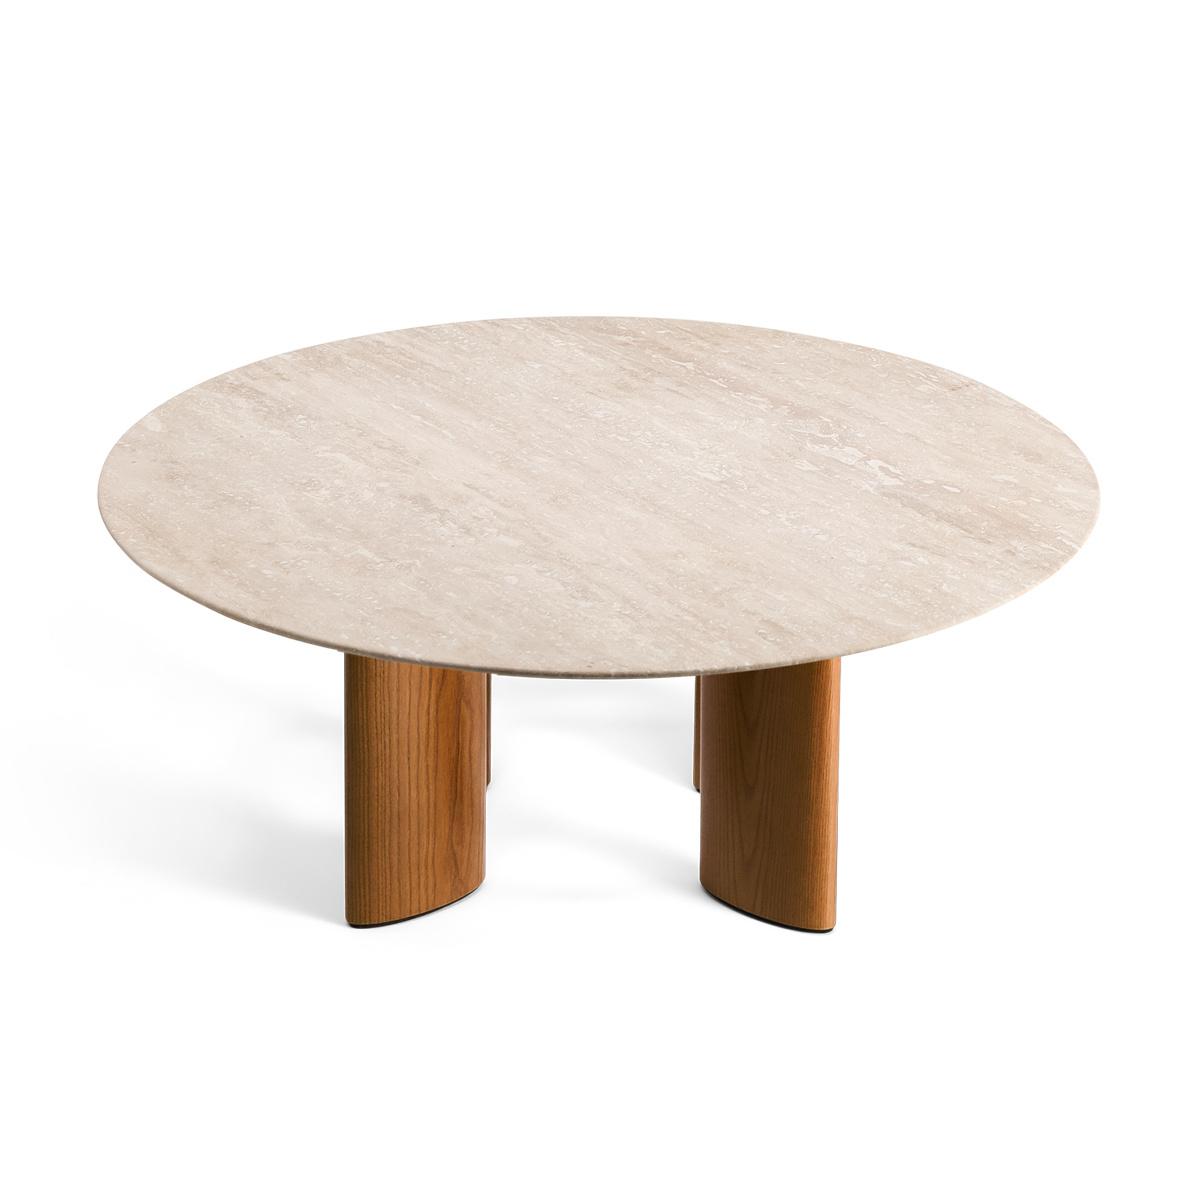 Carlotta Coffee Table, Travertine Top and Ash Wood with Iroko Finsh Legs